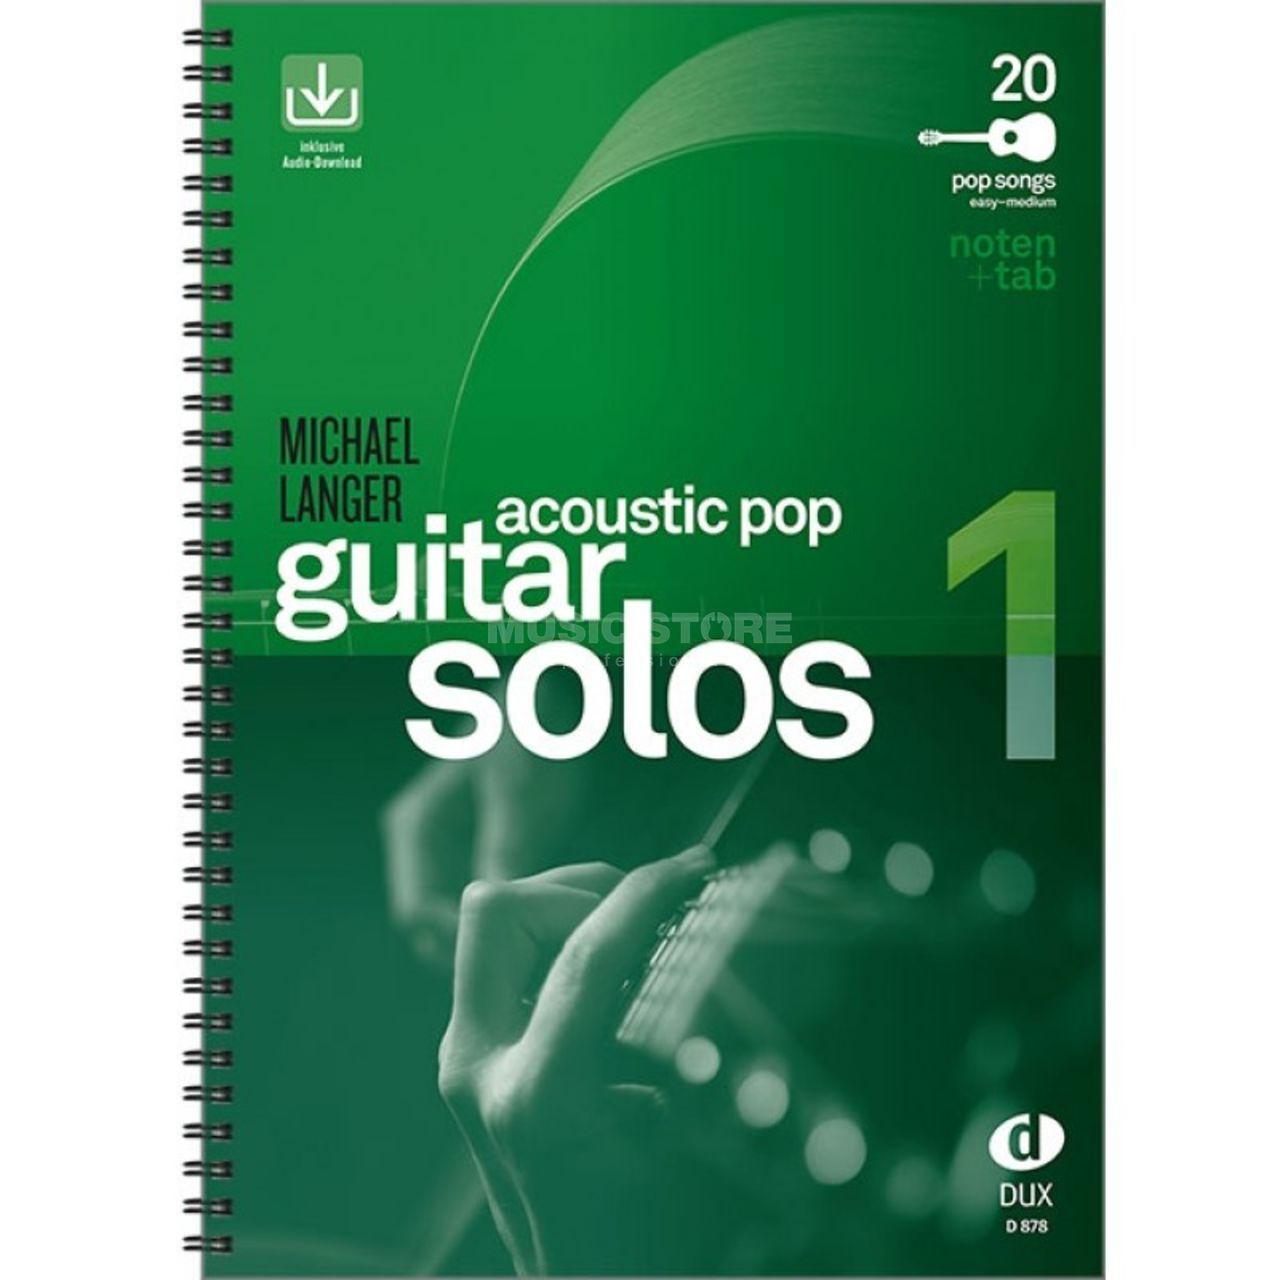 Michael Langer Acoustic Pop Guitar Solos 1 Noten /& TAB easy//medium D878